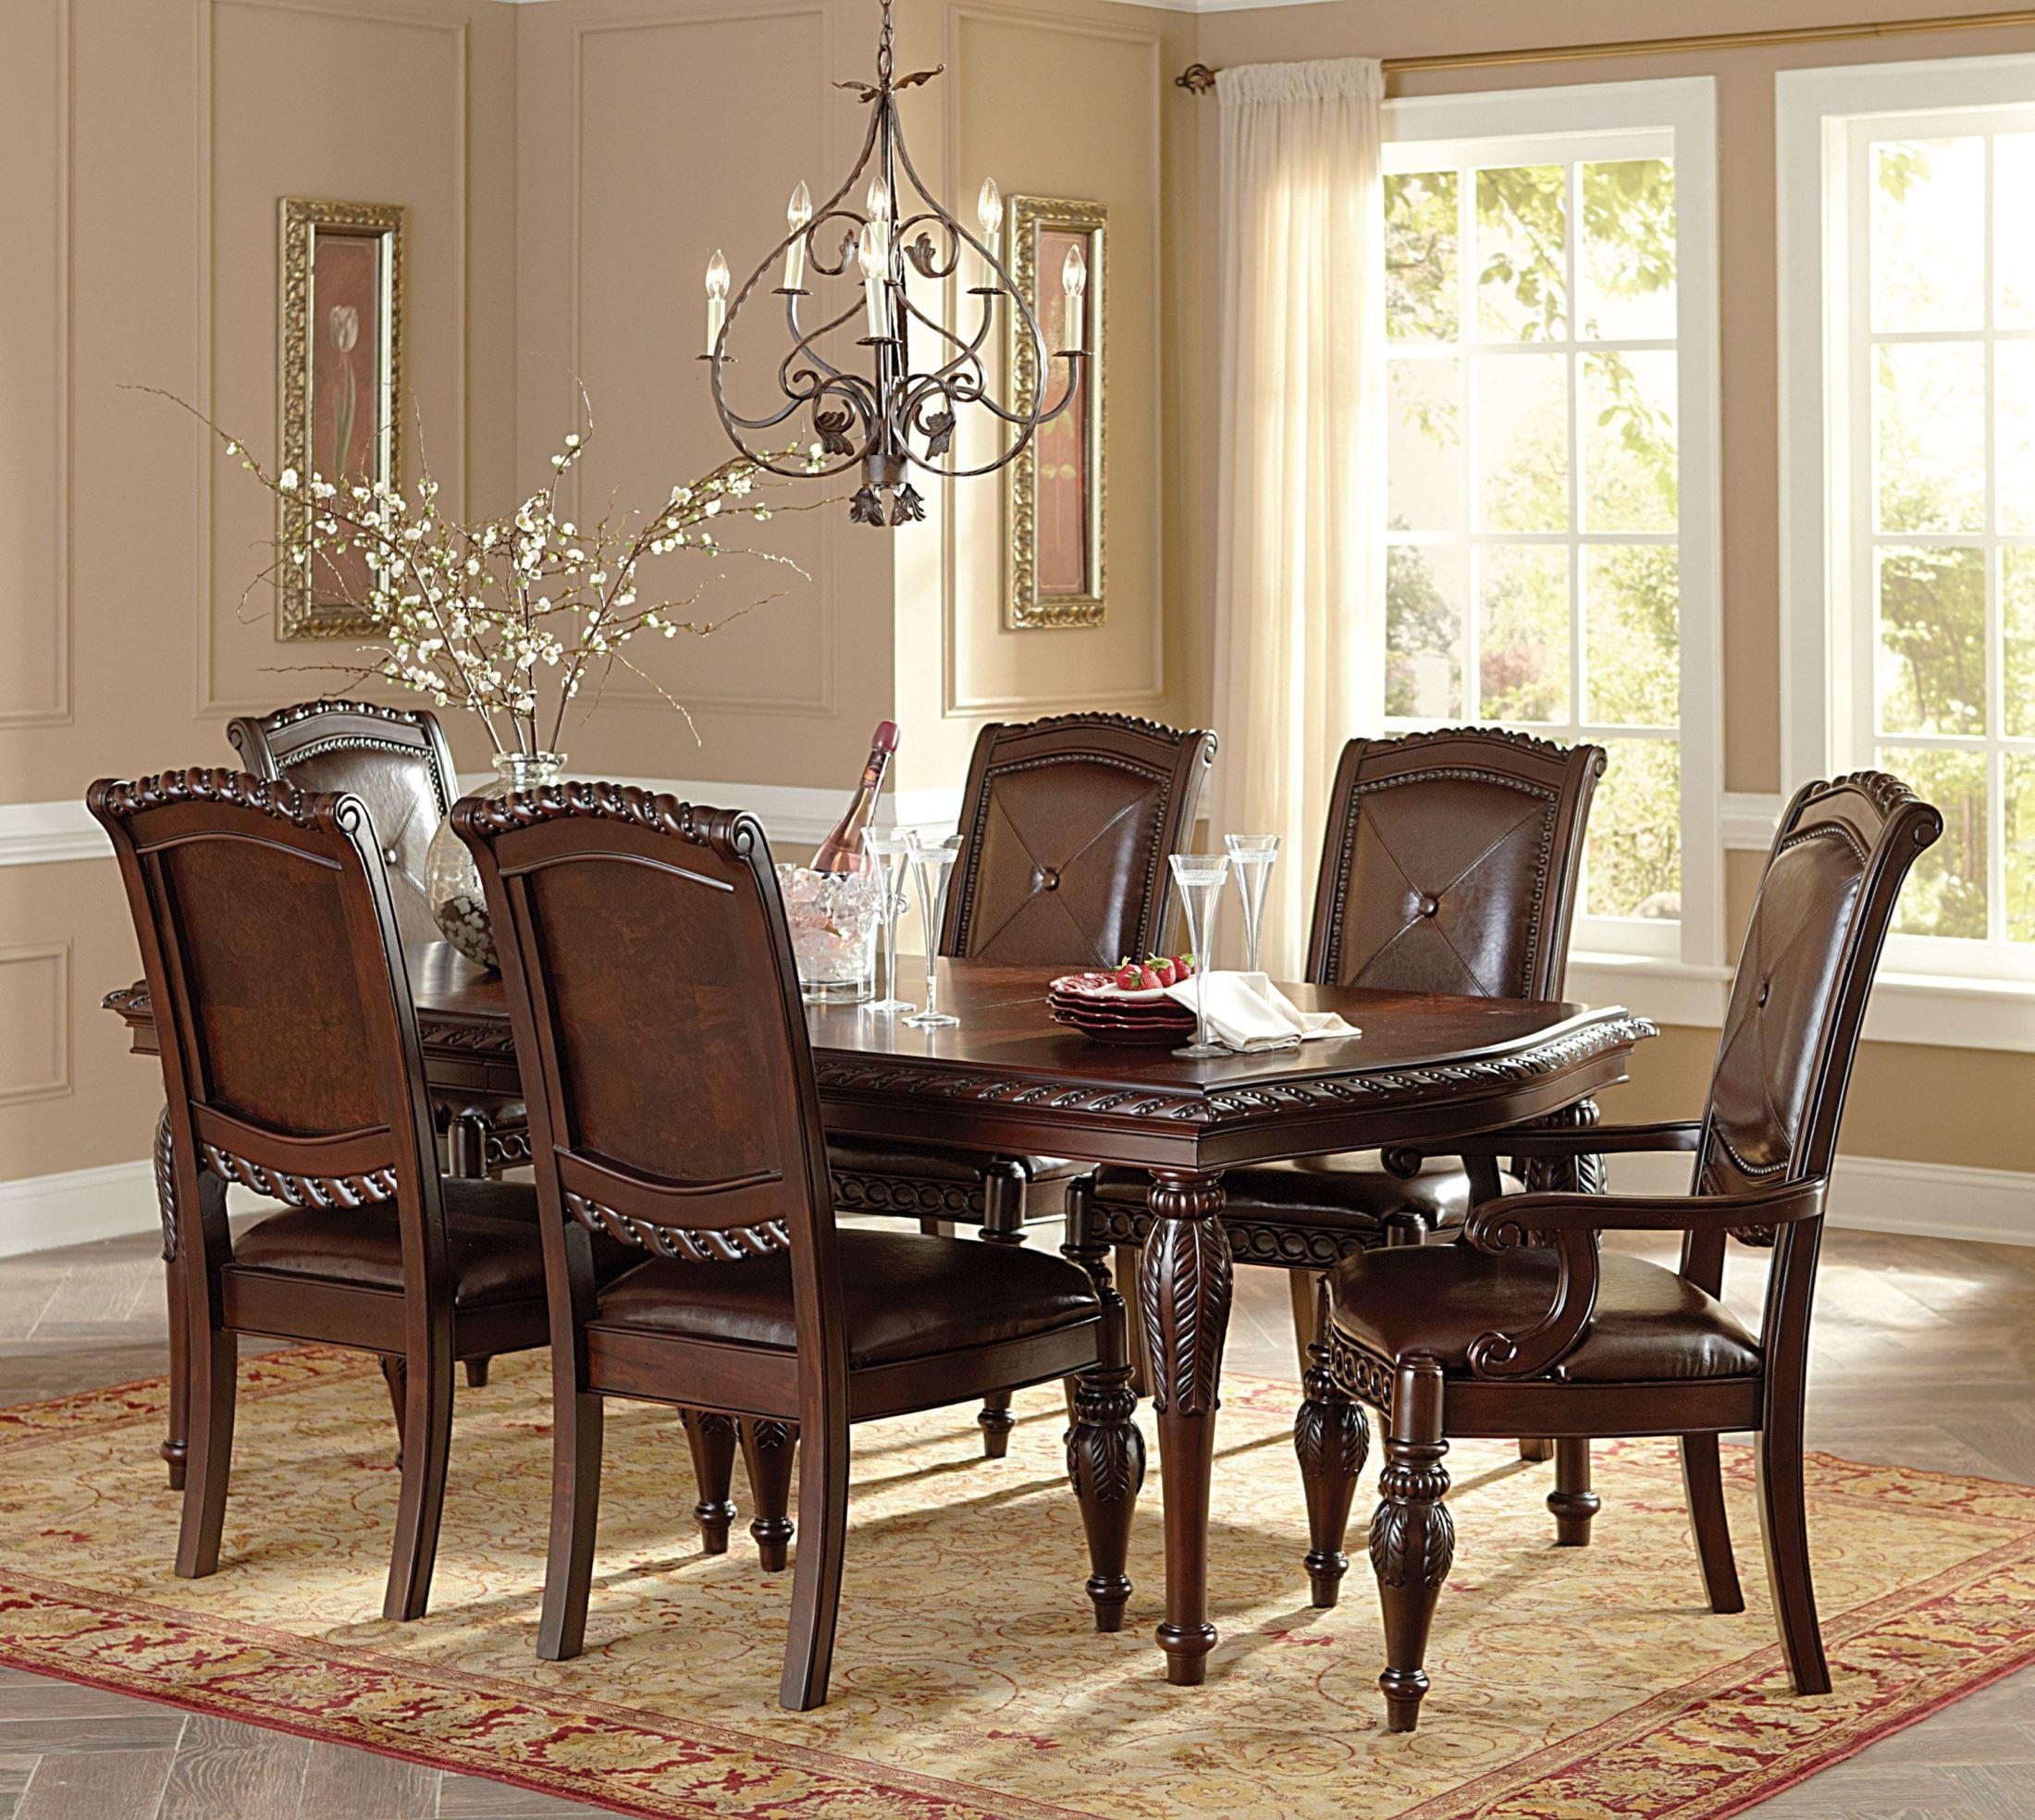 Antoinette Warm Brown Extendable Rectangular Dining Room ...